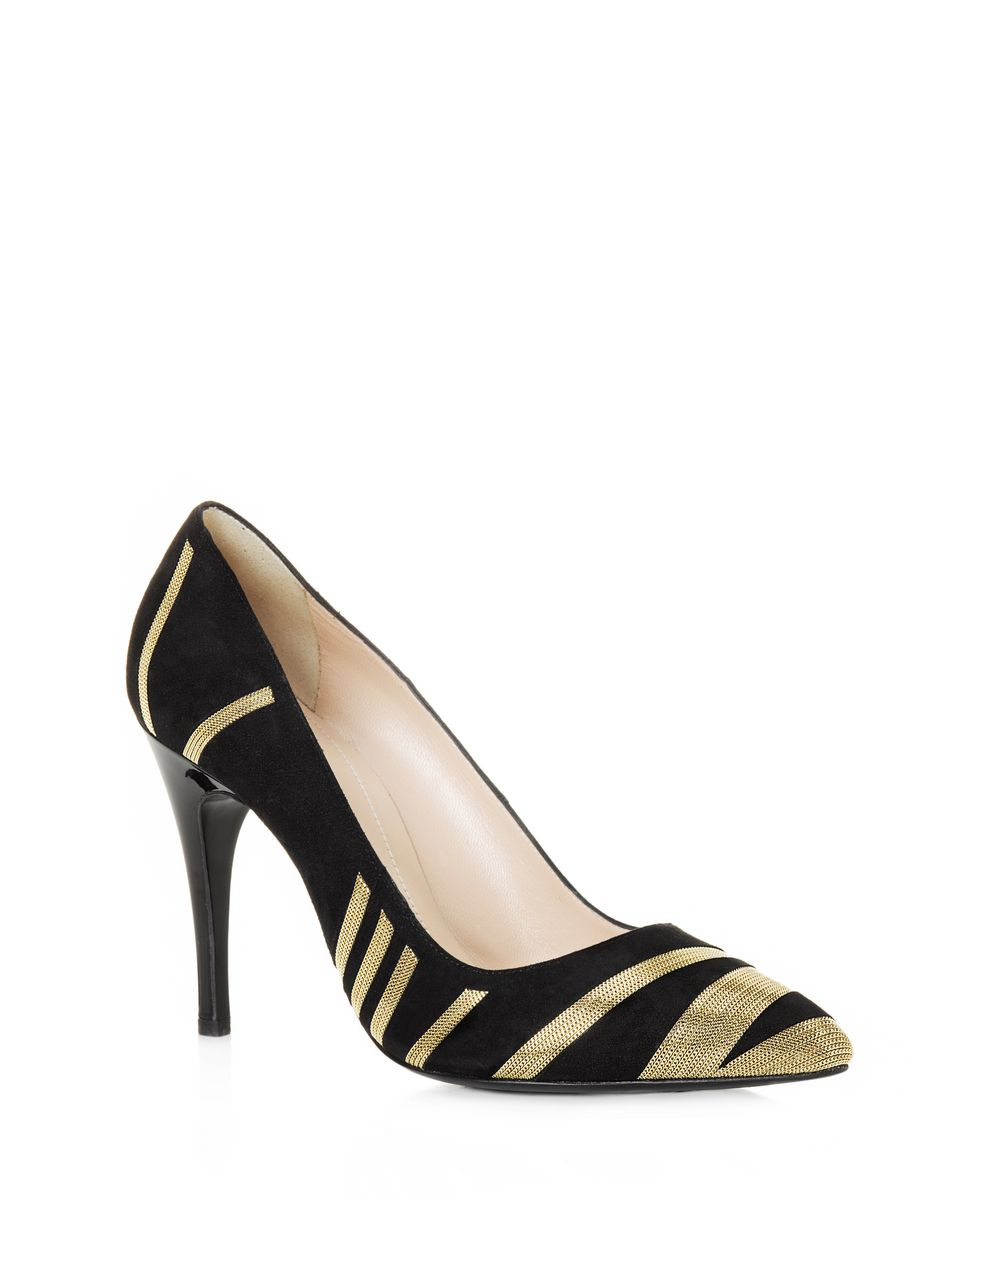 Stiletto pumps - Lanvin